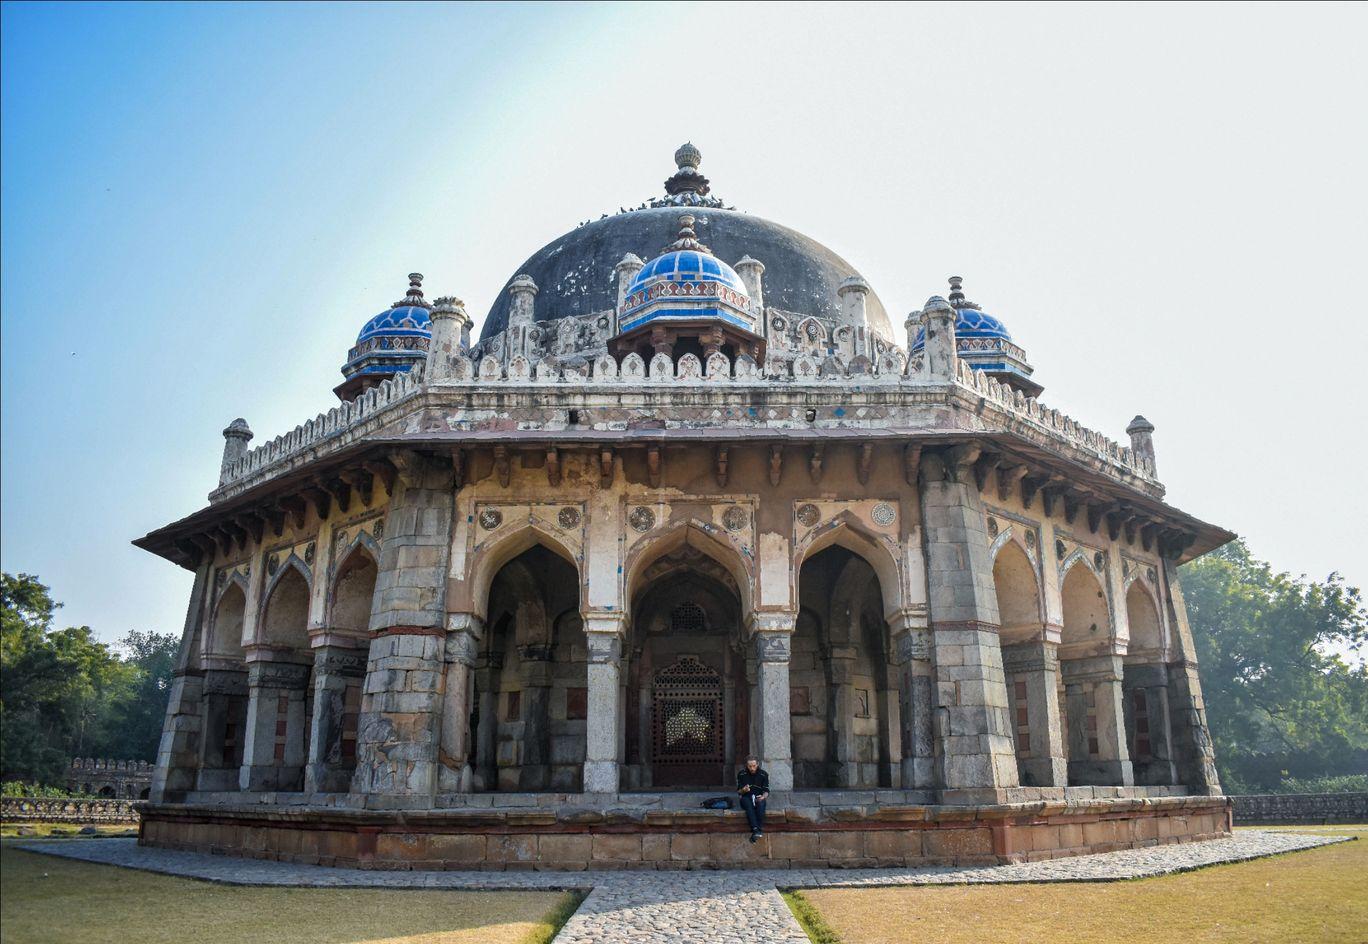 Photo of Isa Khan's Tomb By Saurav Akhouri